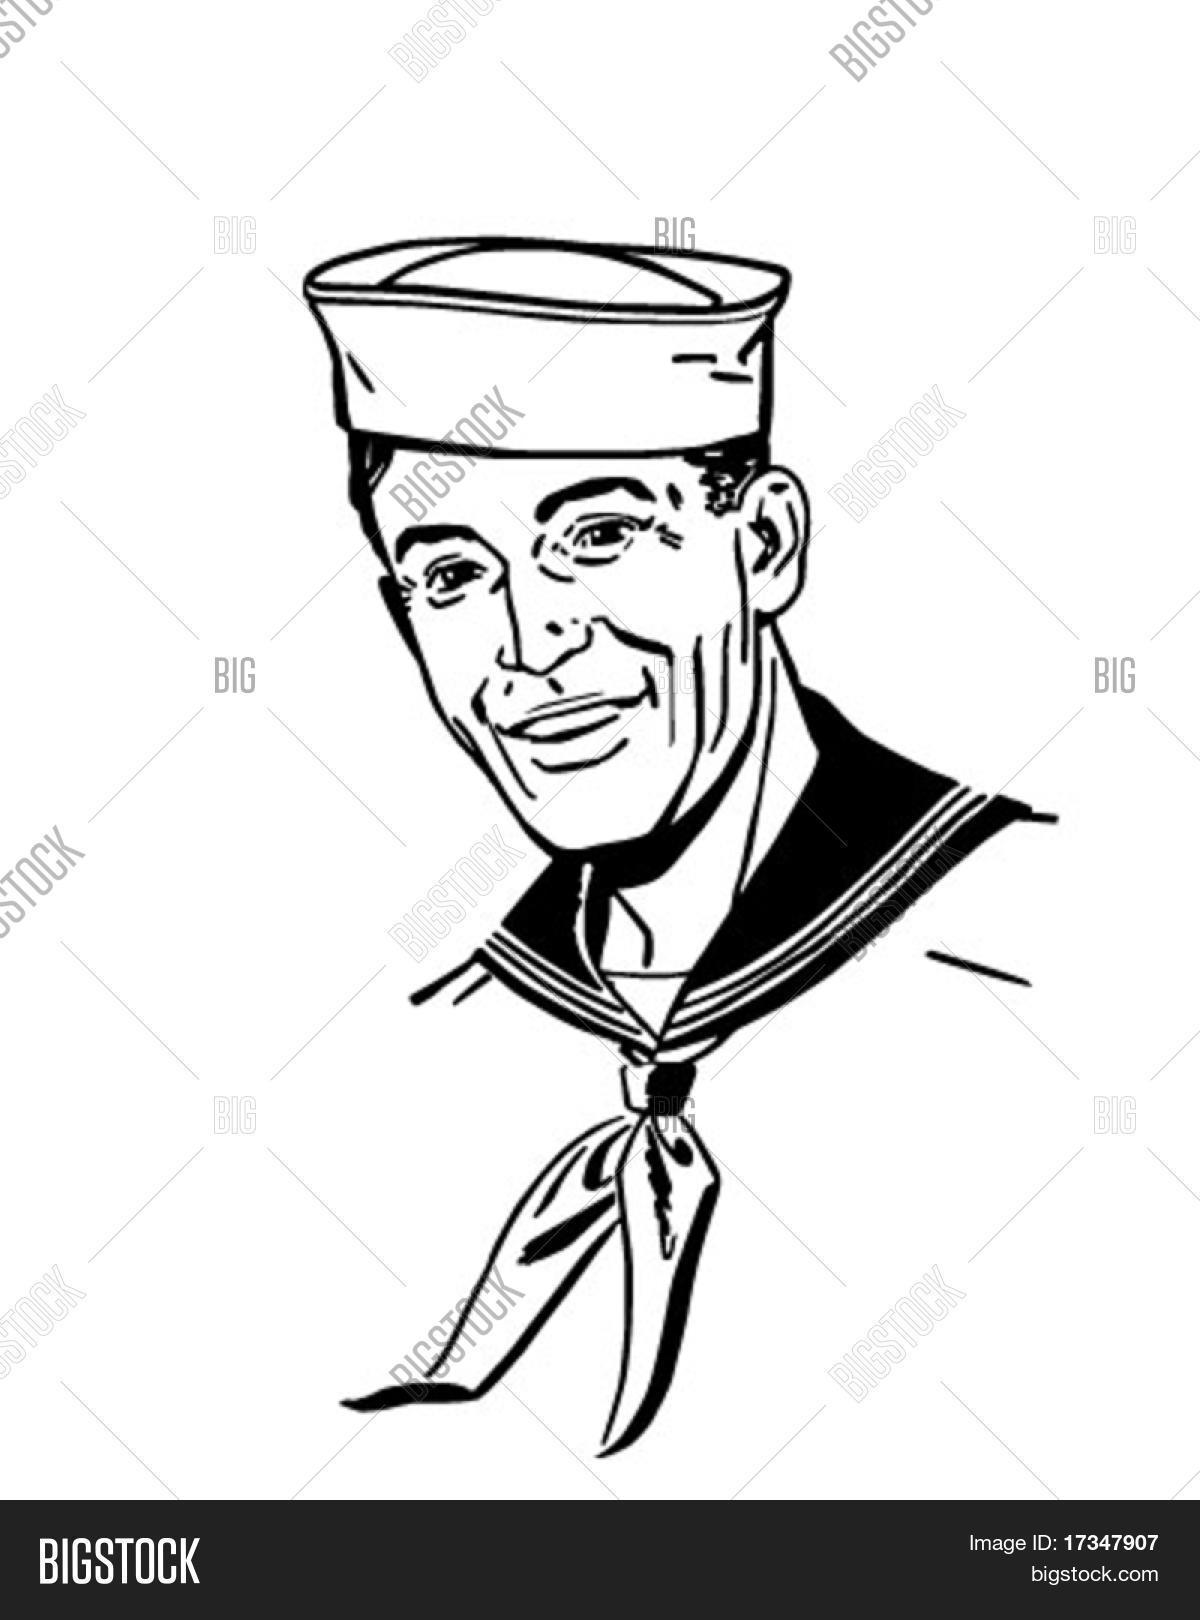 Navy clipart seaman uniform, Navy seaman uniform Transparent FREE for  download on WebStockReview 2020